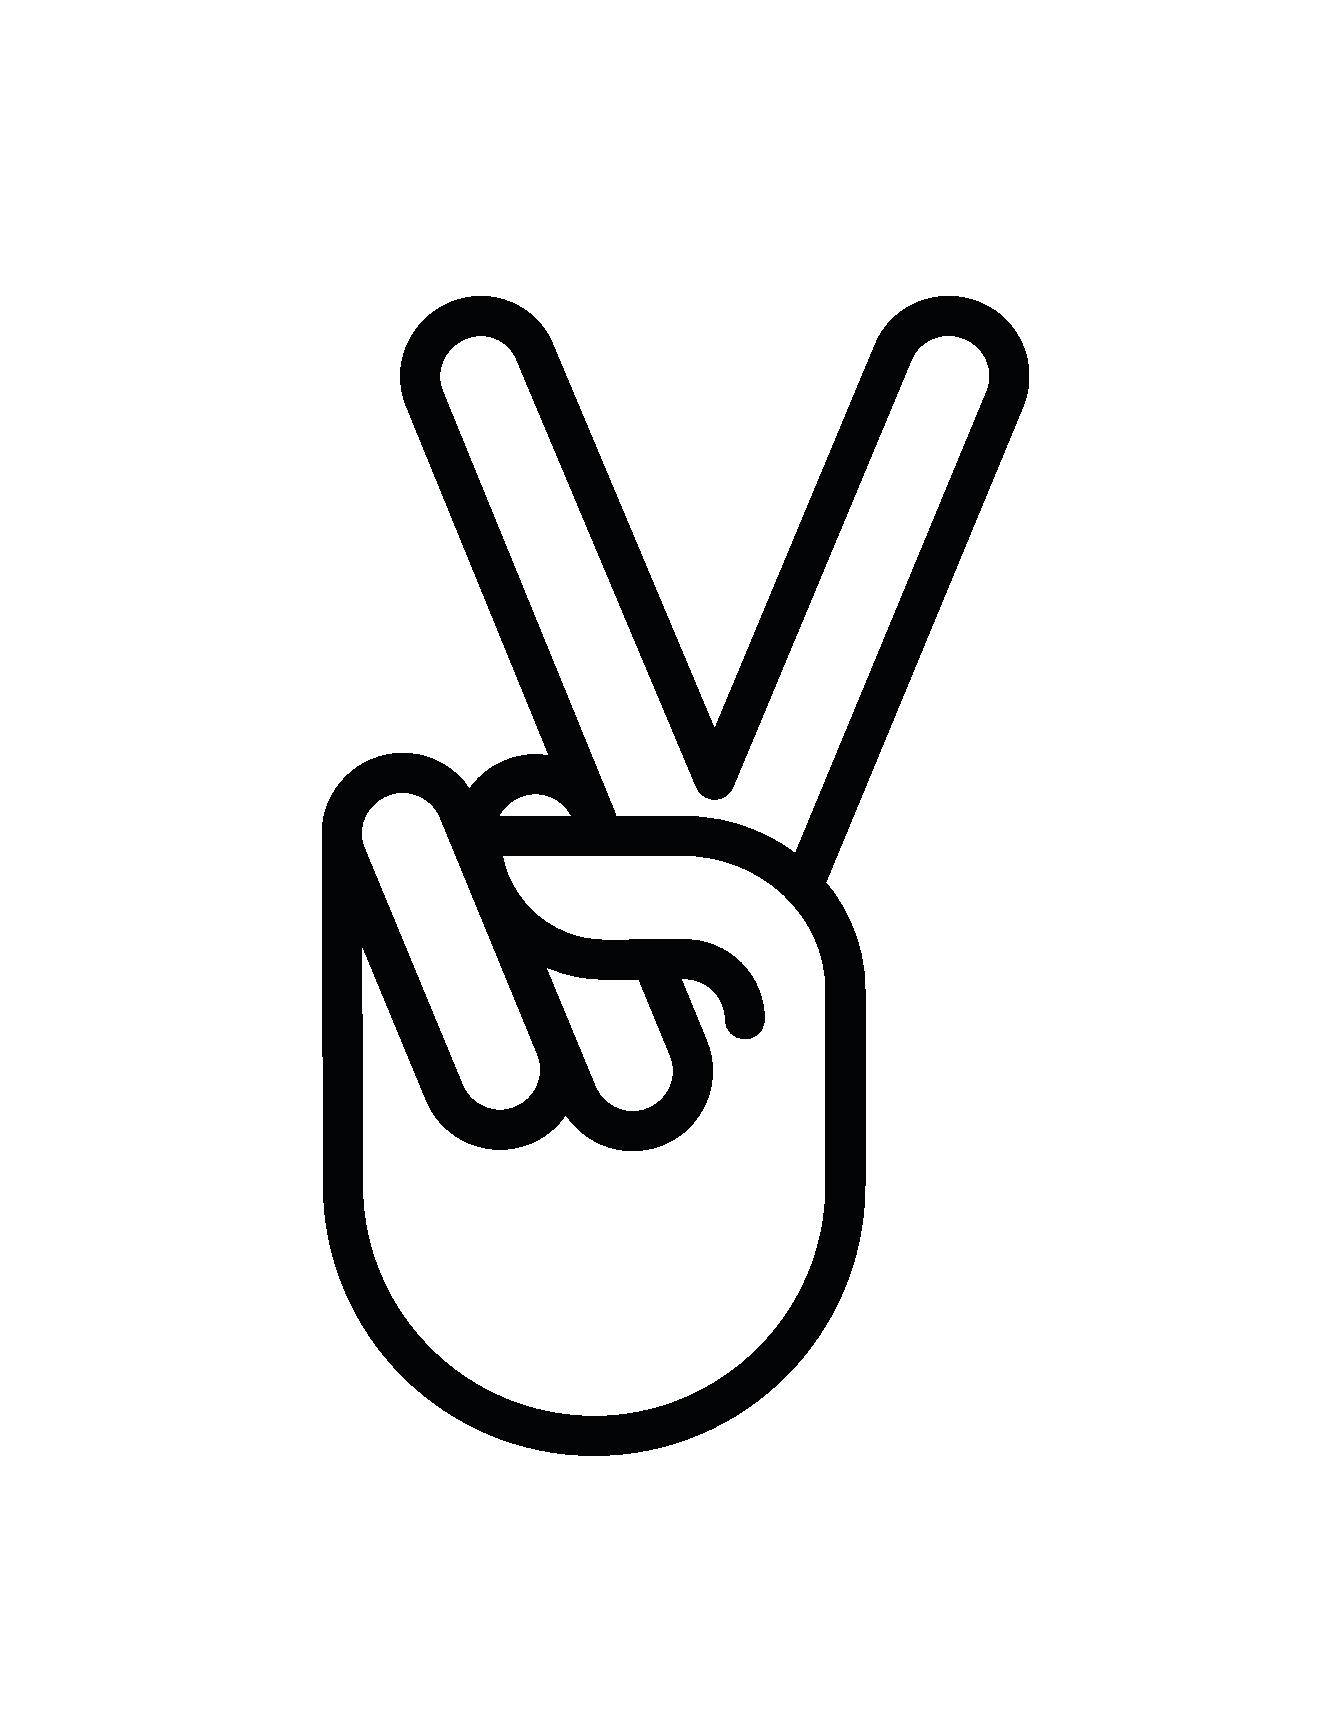 Hands clipart logo. Hand peace sign panda